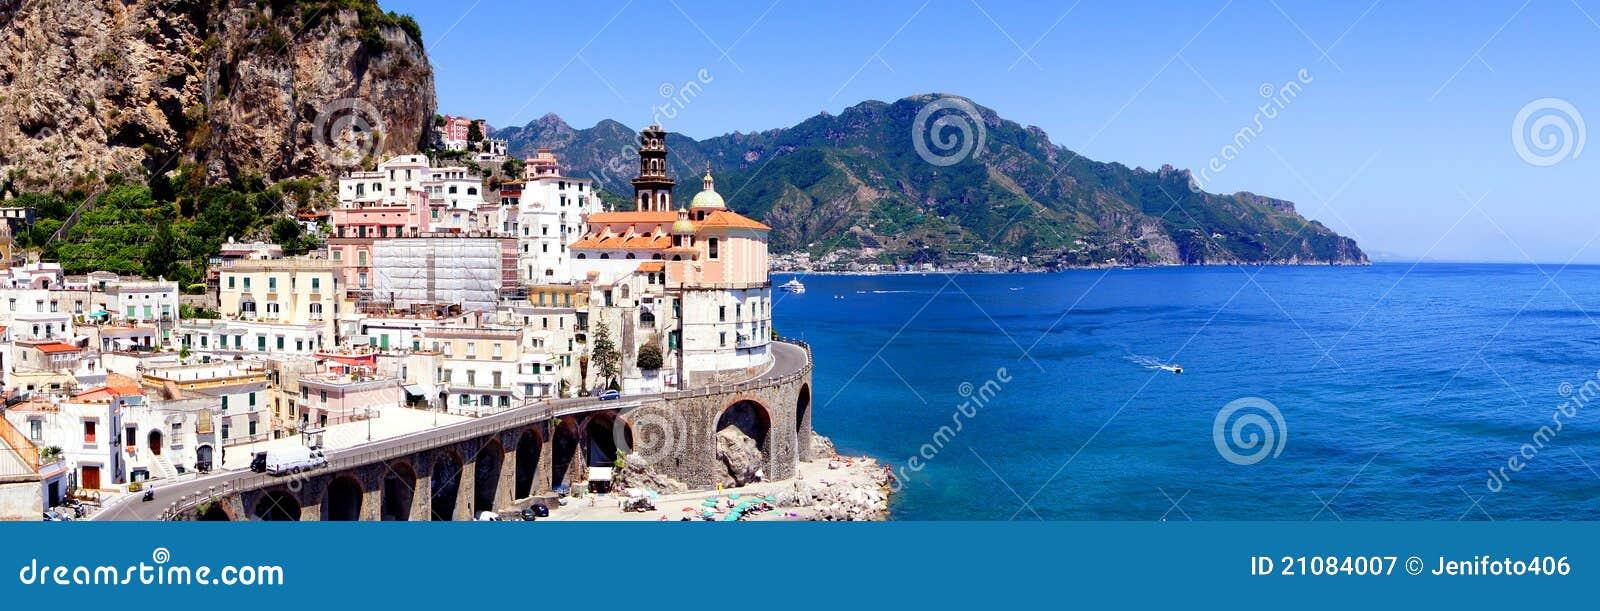 Panorama del litorale di Amalfi